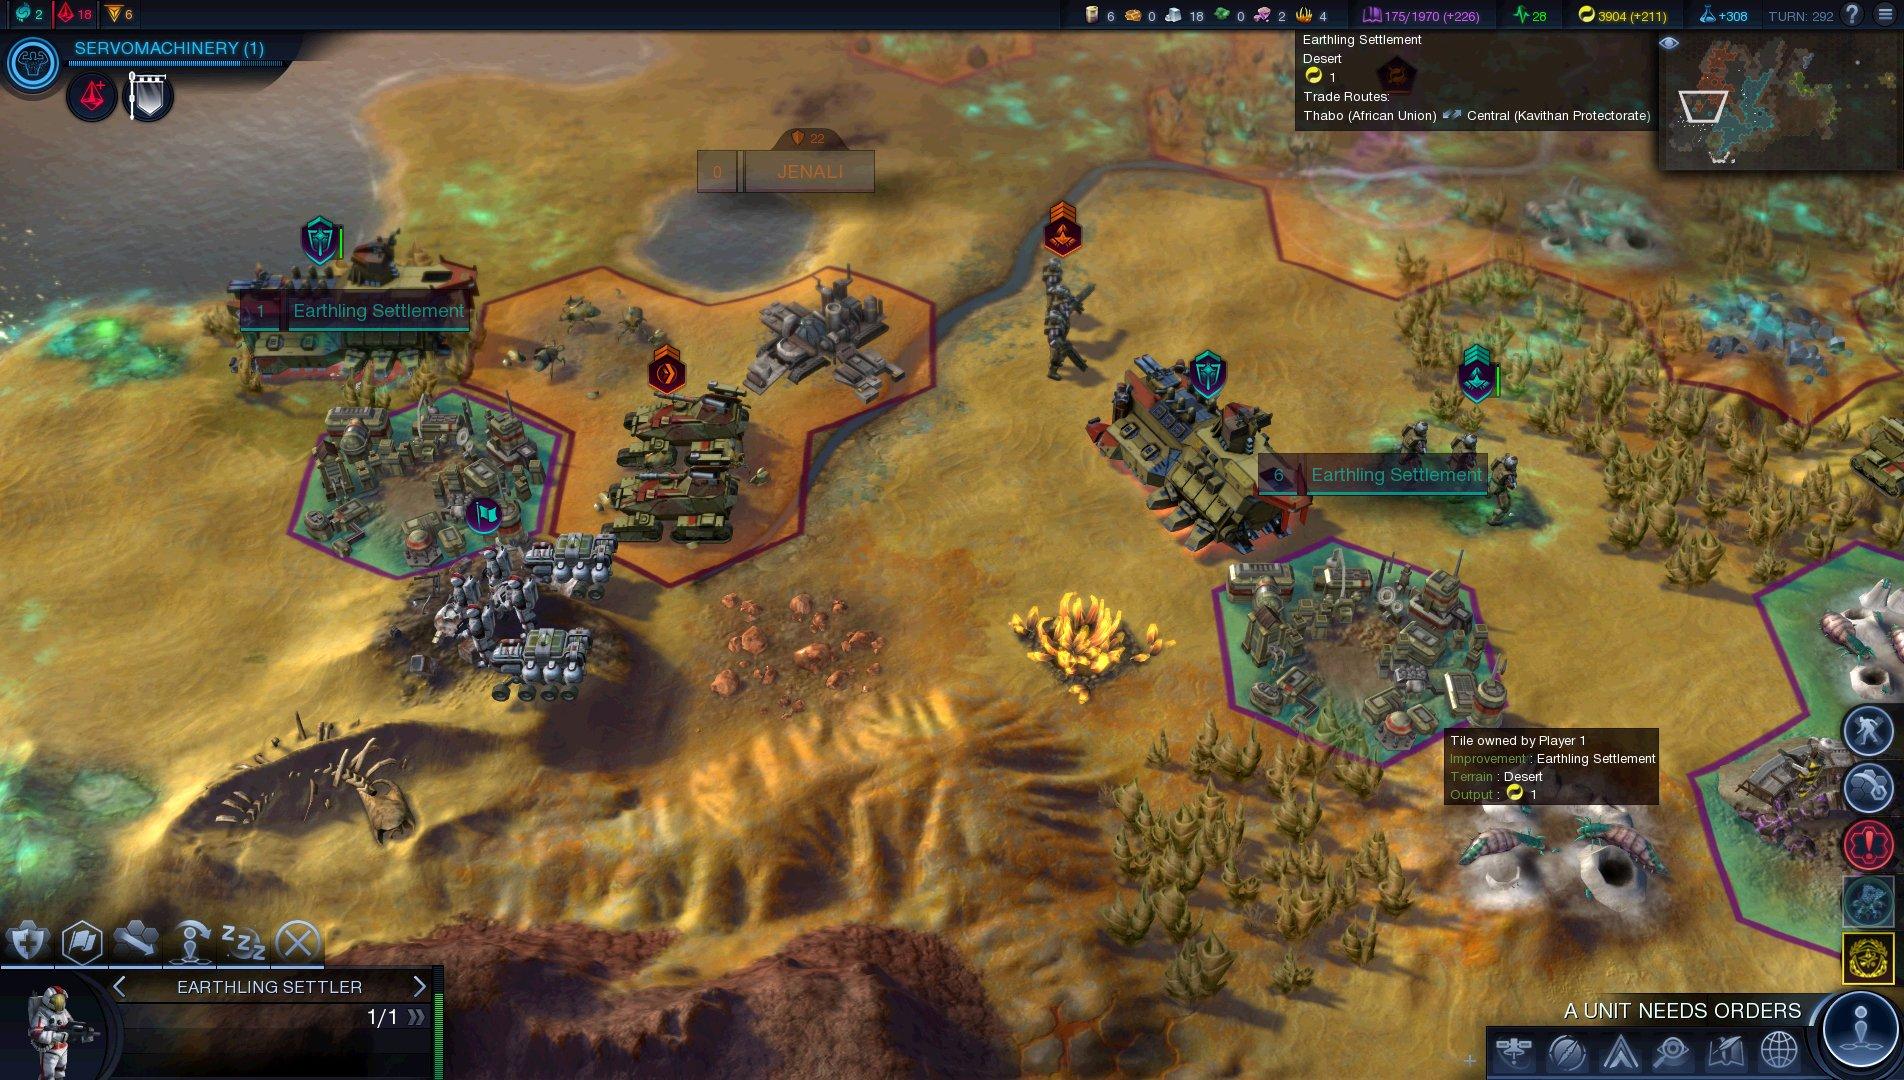 Sid Meier's Civilization: Beyond Earth - PC Performance Analysis